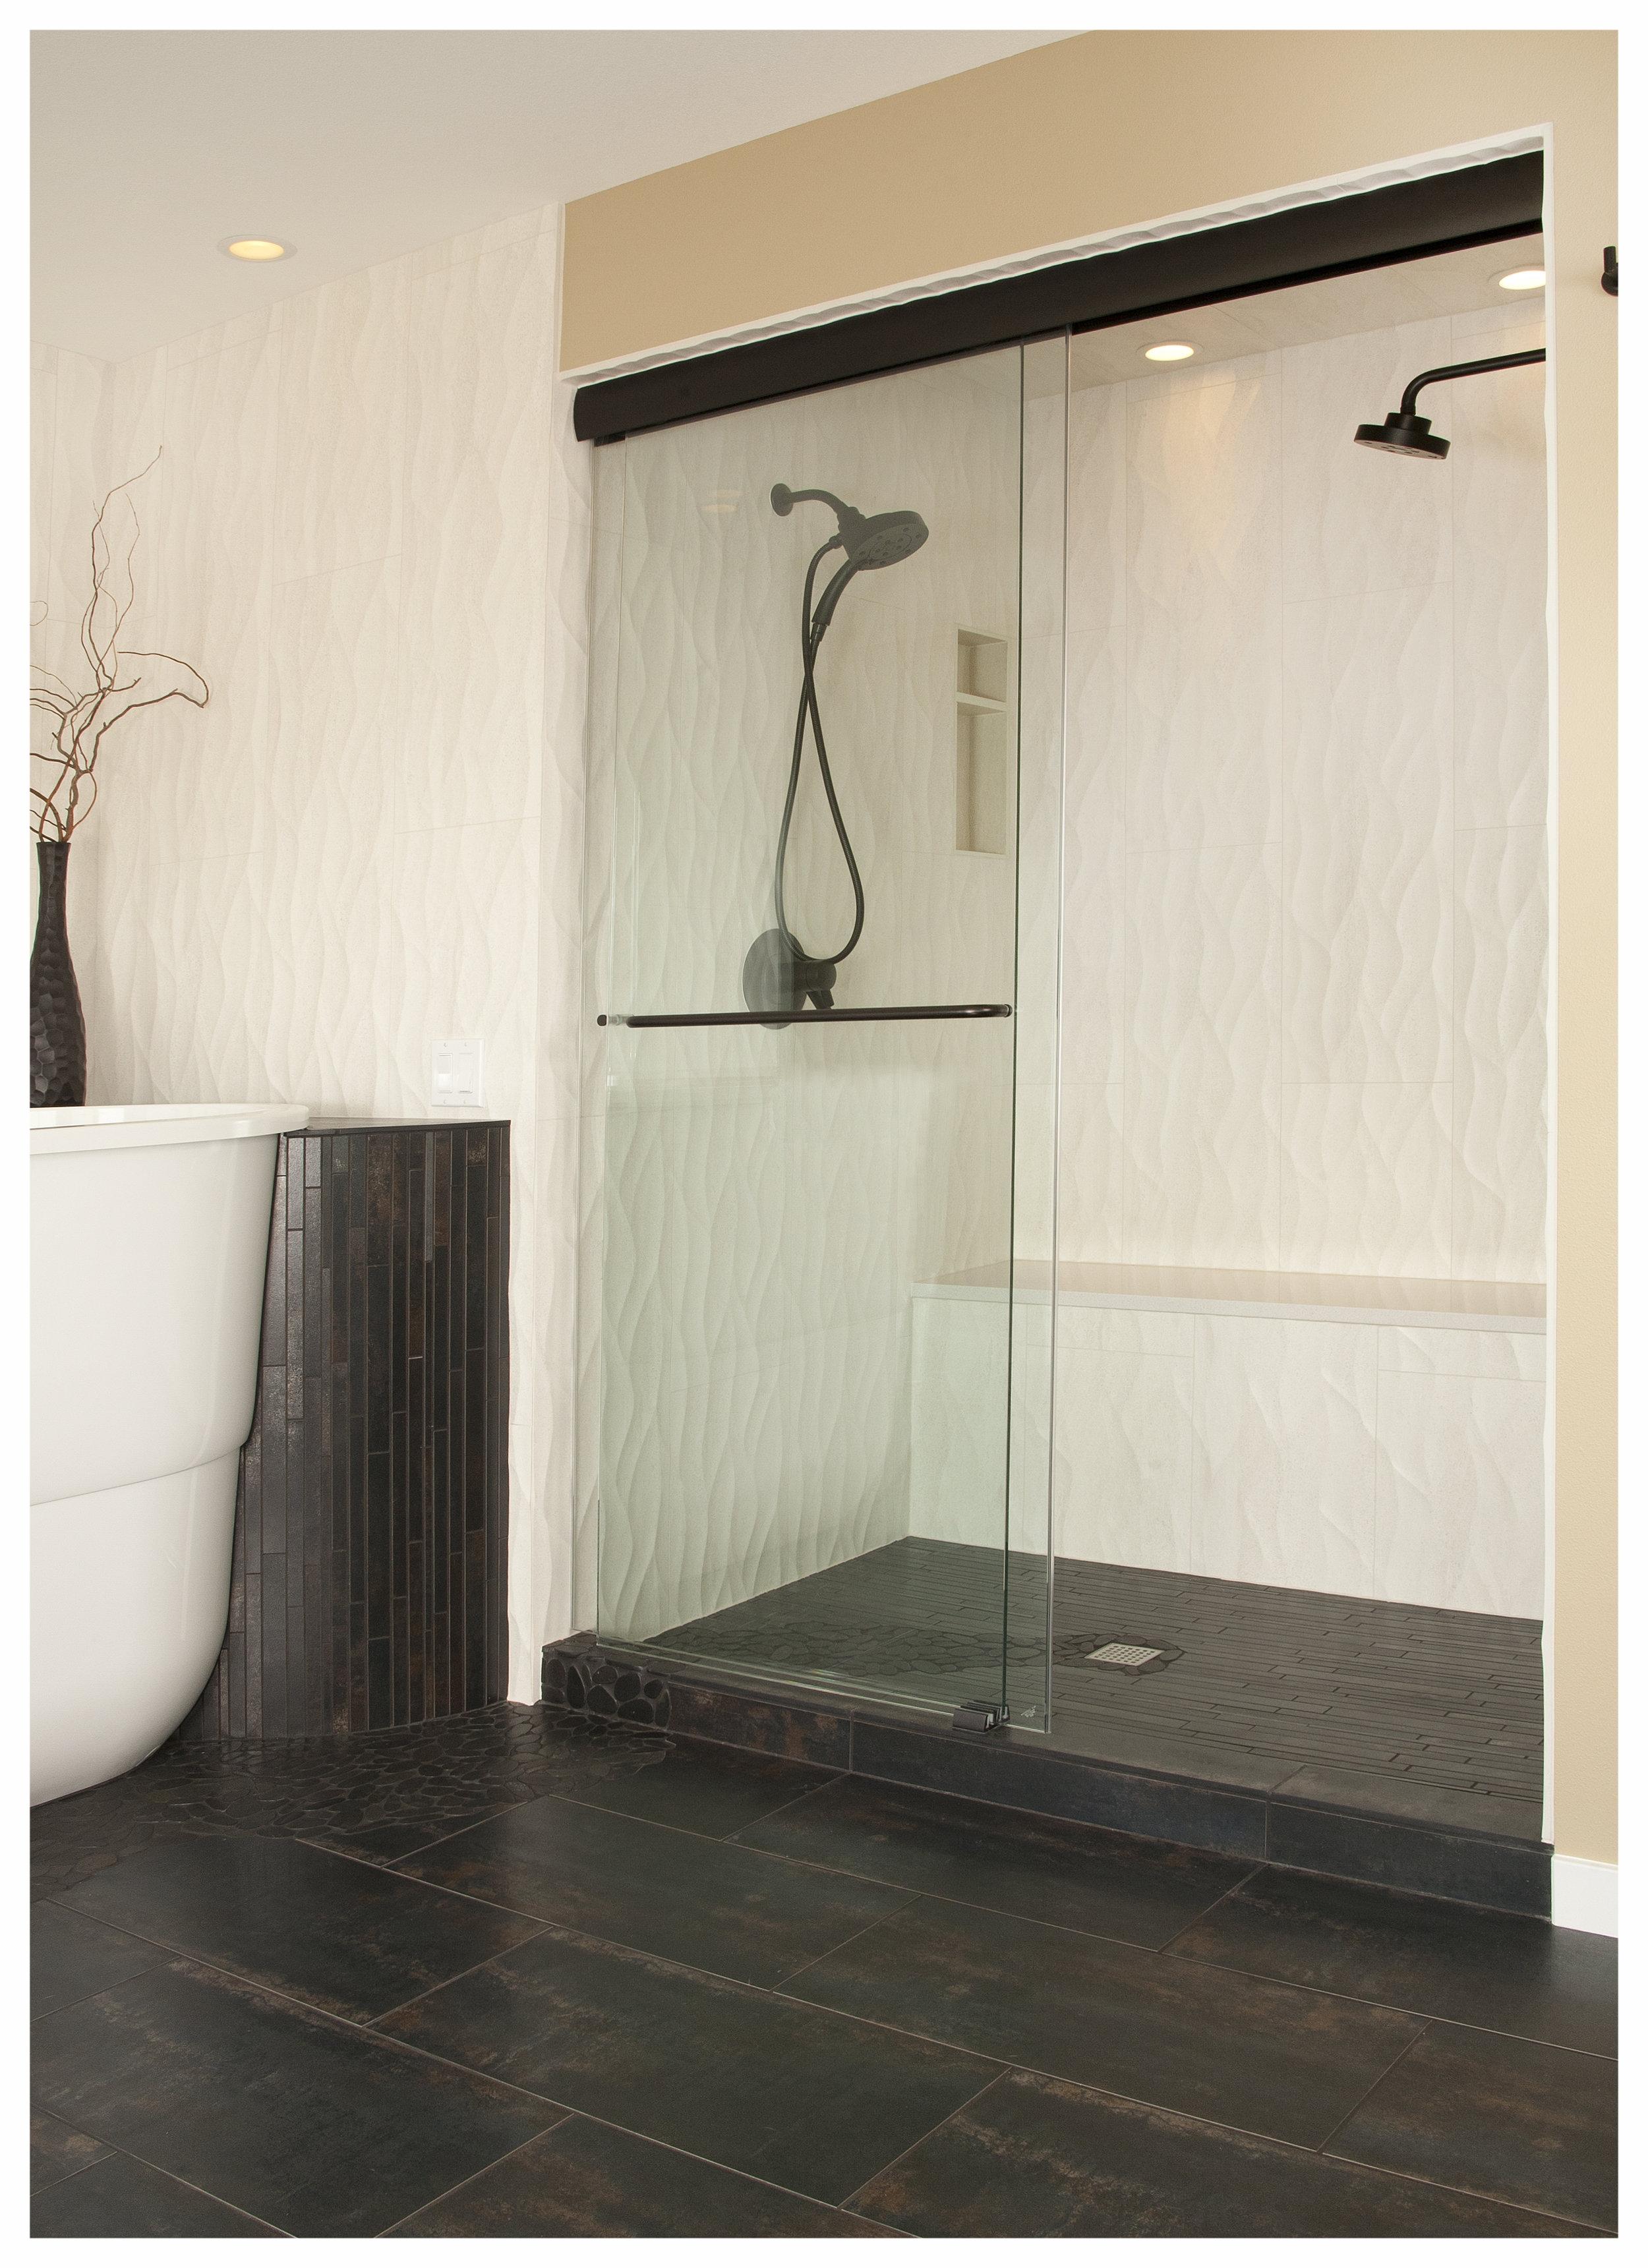 Kirkland Contemporary Master Bath 8 (2).jpg